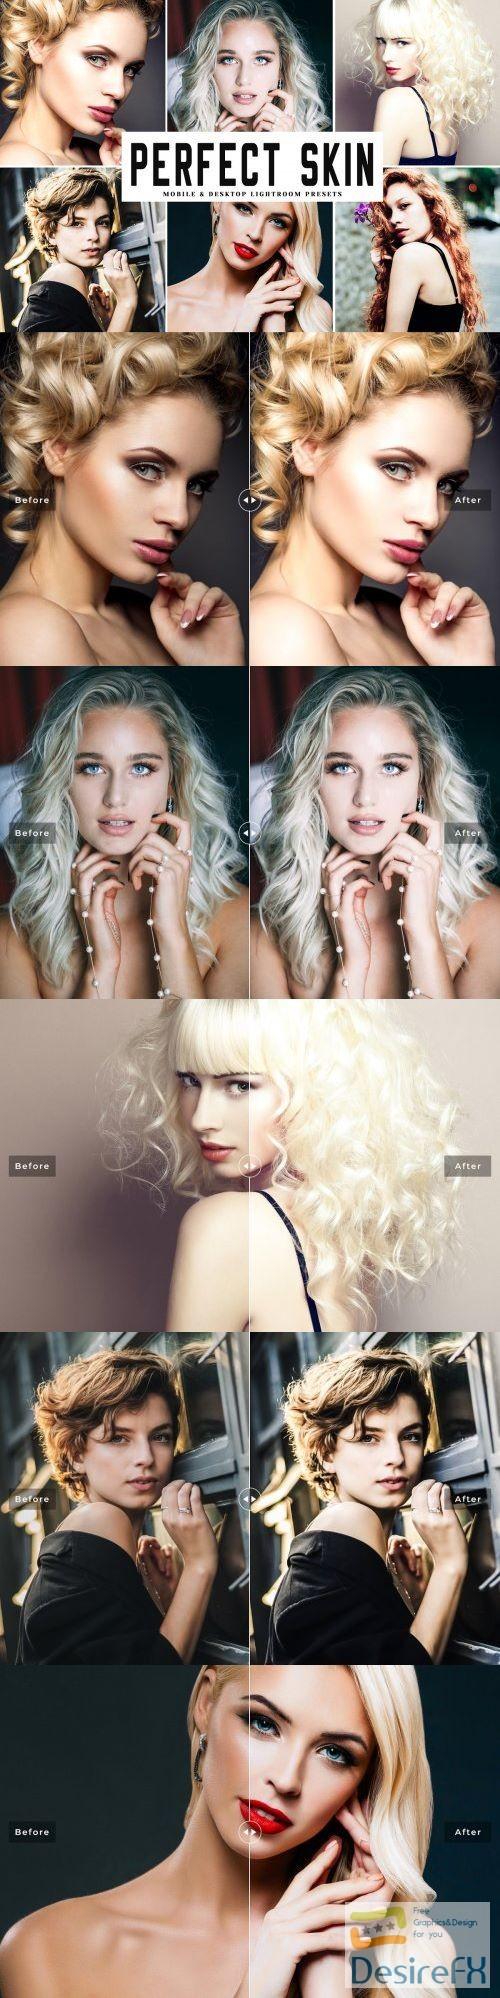 photoshop - Perfect Skin Lightroom Presets 4025916